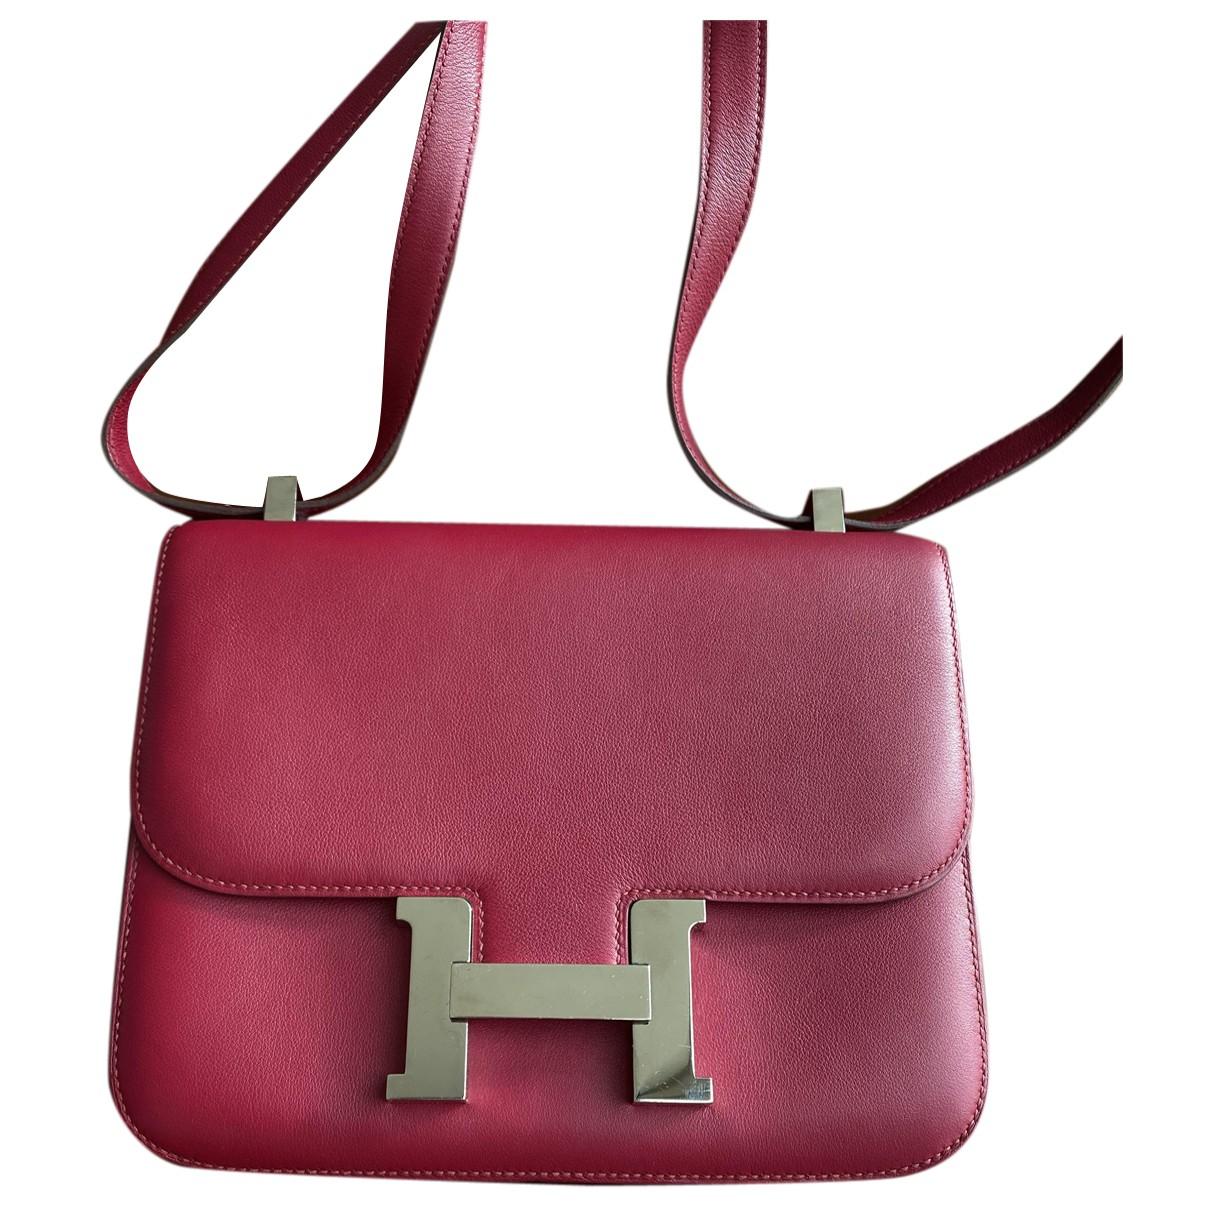 Hermès Constance Pink Leather handbag for Women N